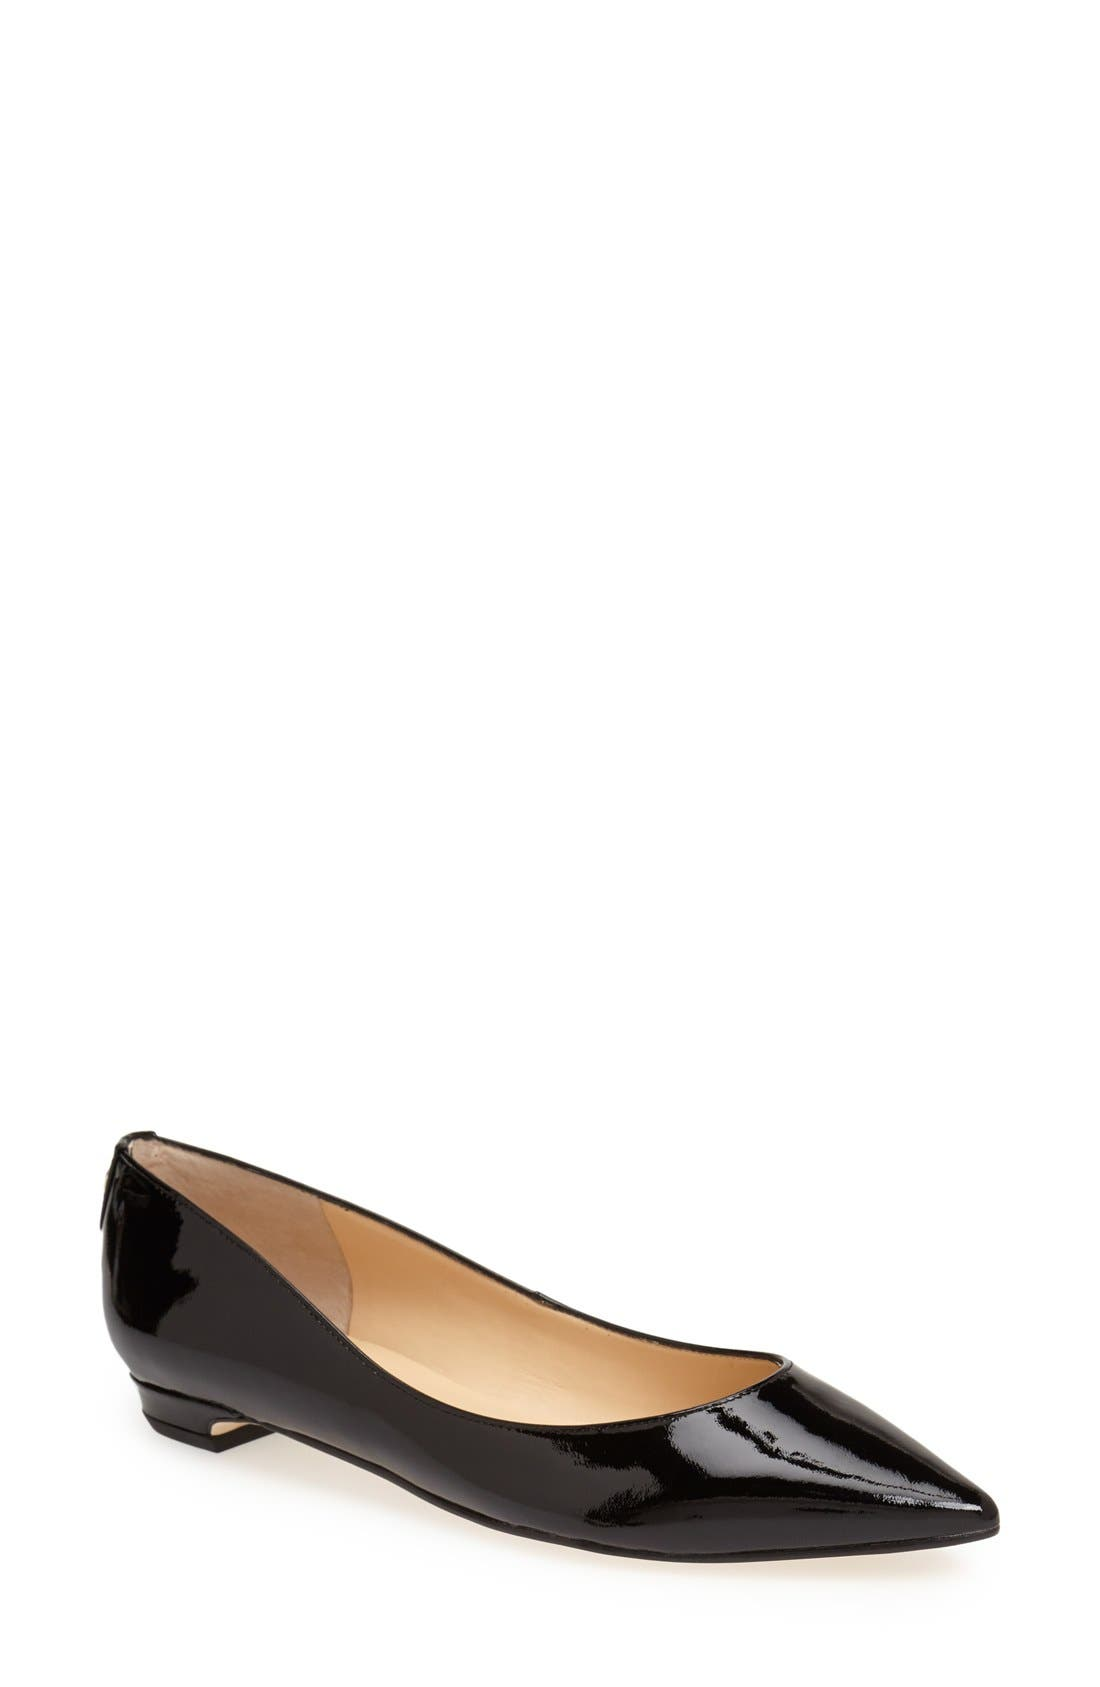 Main Image - Ivanka Trump 'Tizzy' Pointed Toe Ballet Flat (Women)